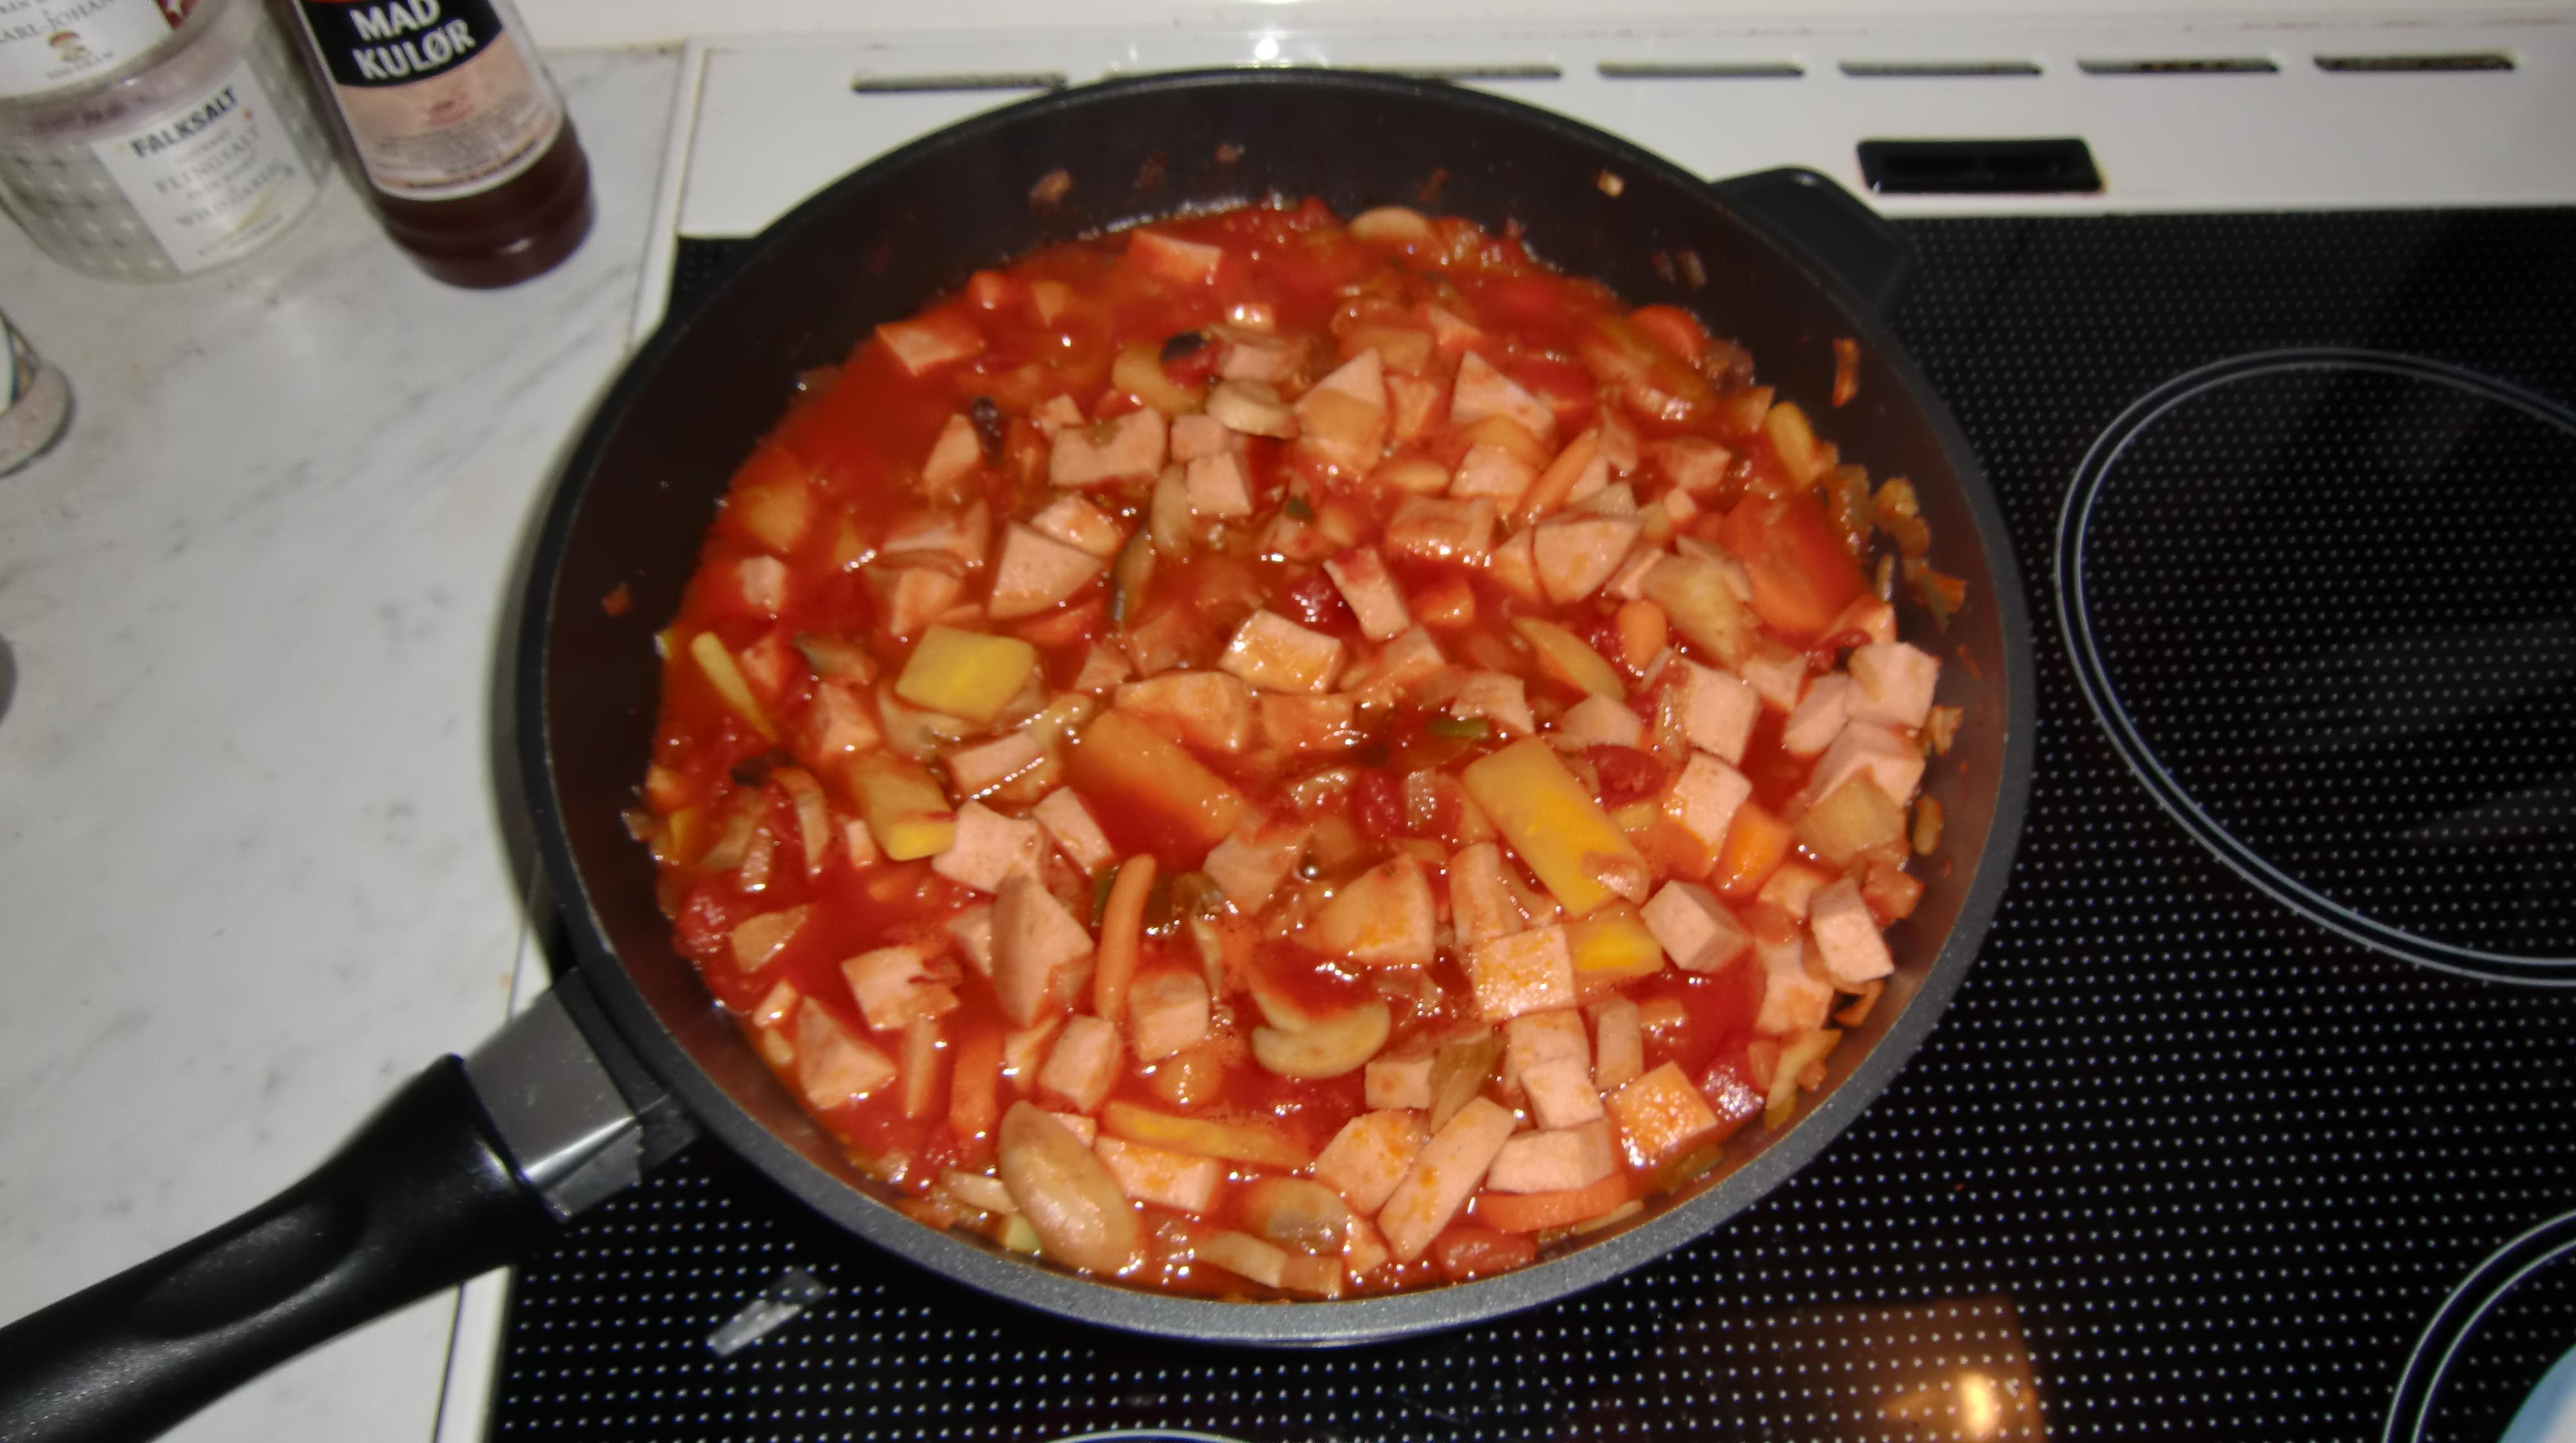 falukorv wok